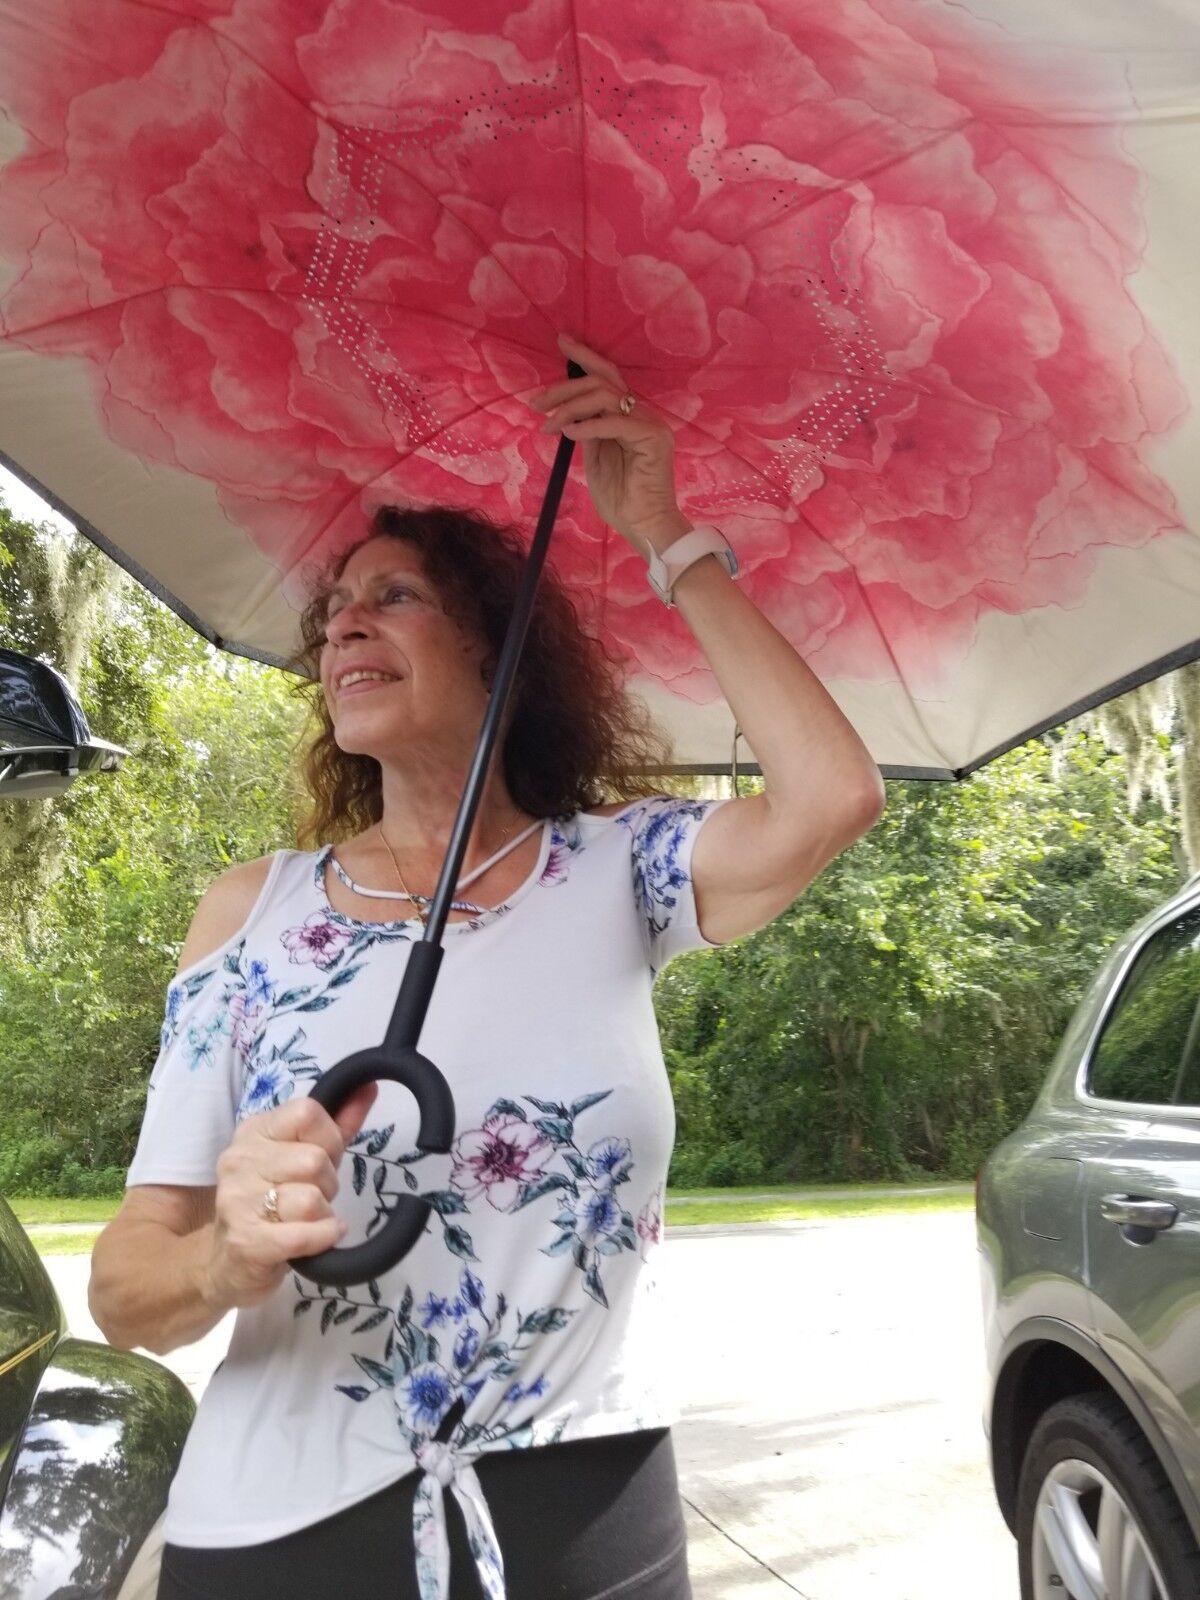 NEW Rose C Handle Double Layer inverted Reverse upside down Umbrella U1